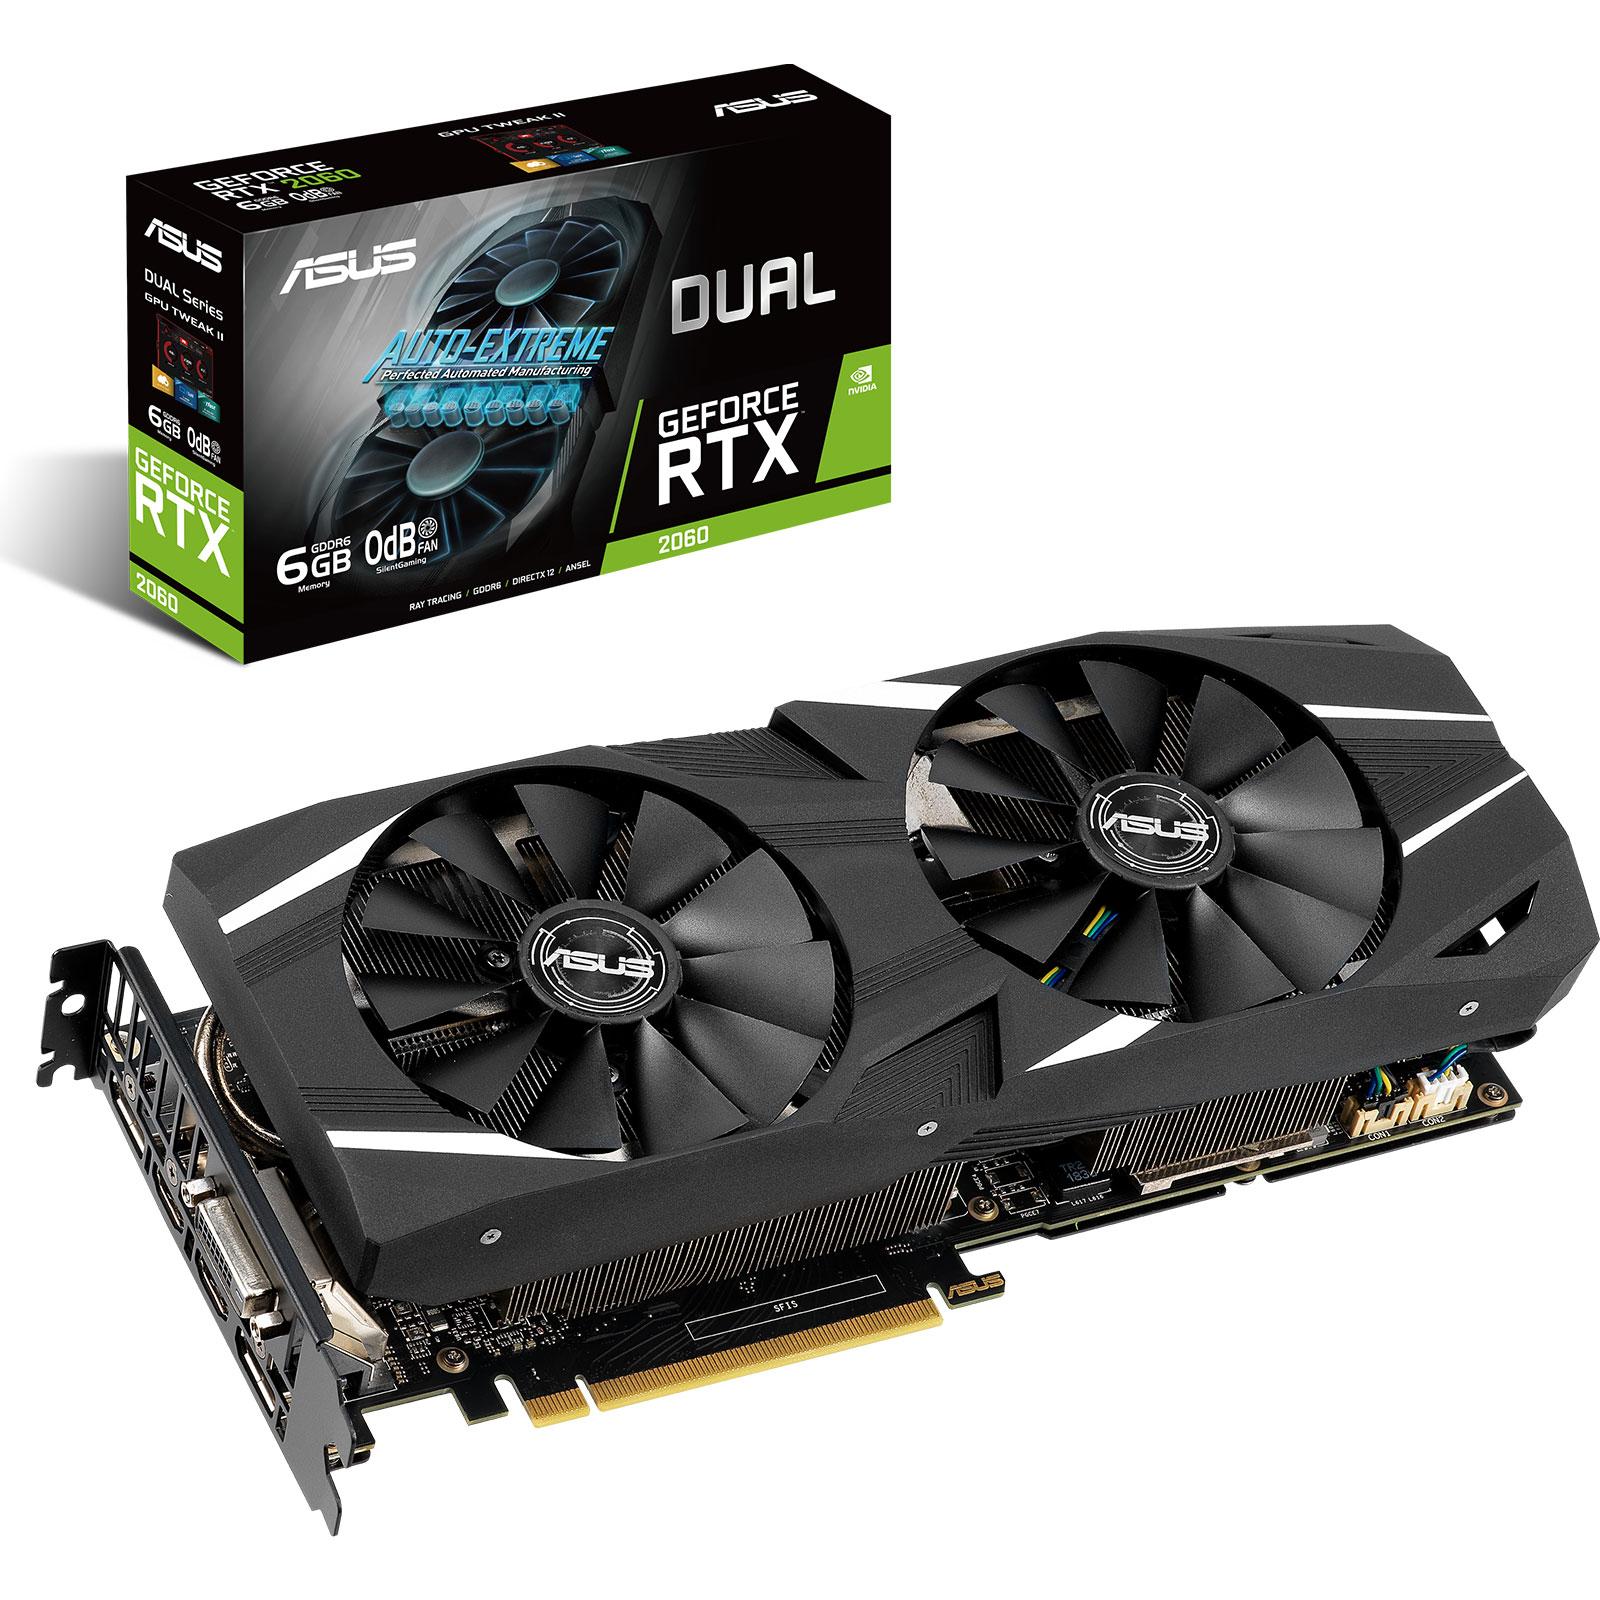 Carte graphique ASUS GeForce RTX 2060 DUAL-RTX2060-6G 6 Go GDDR6 - Dual HDMI/Dual DisplayPort/DVI - PCI Express (NVIDIA GeForce RTX 2060)